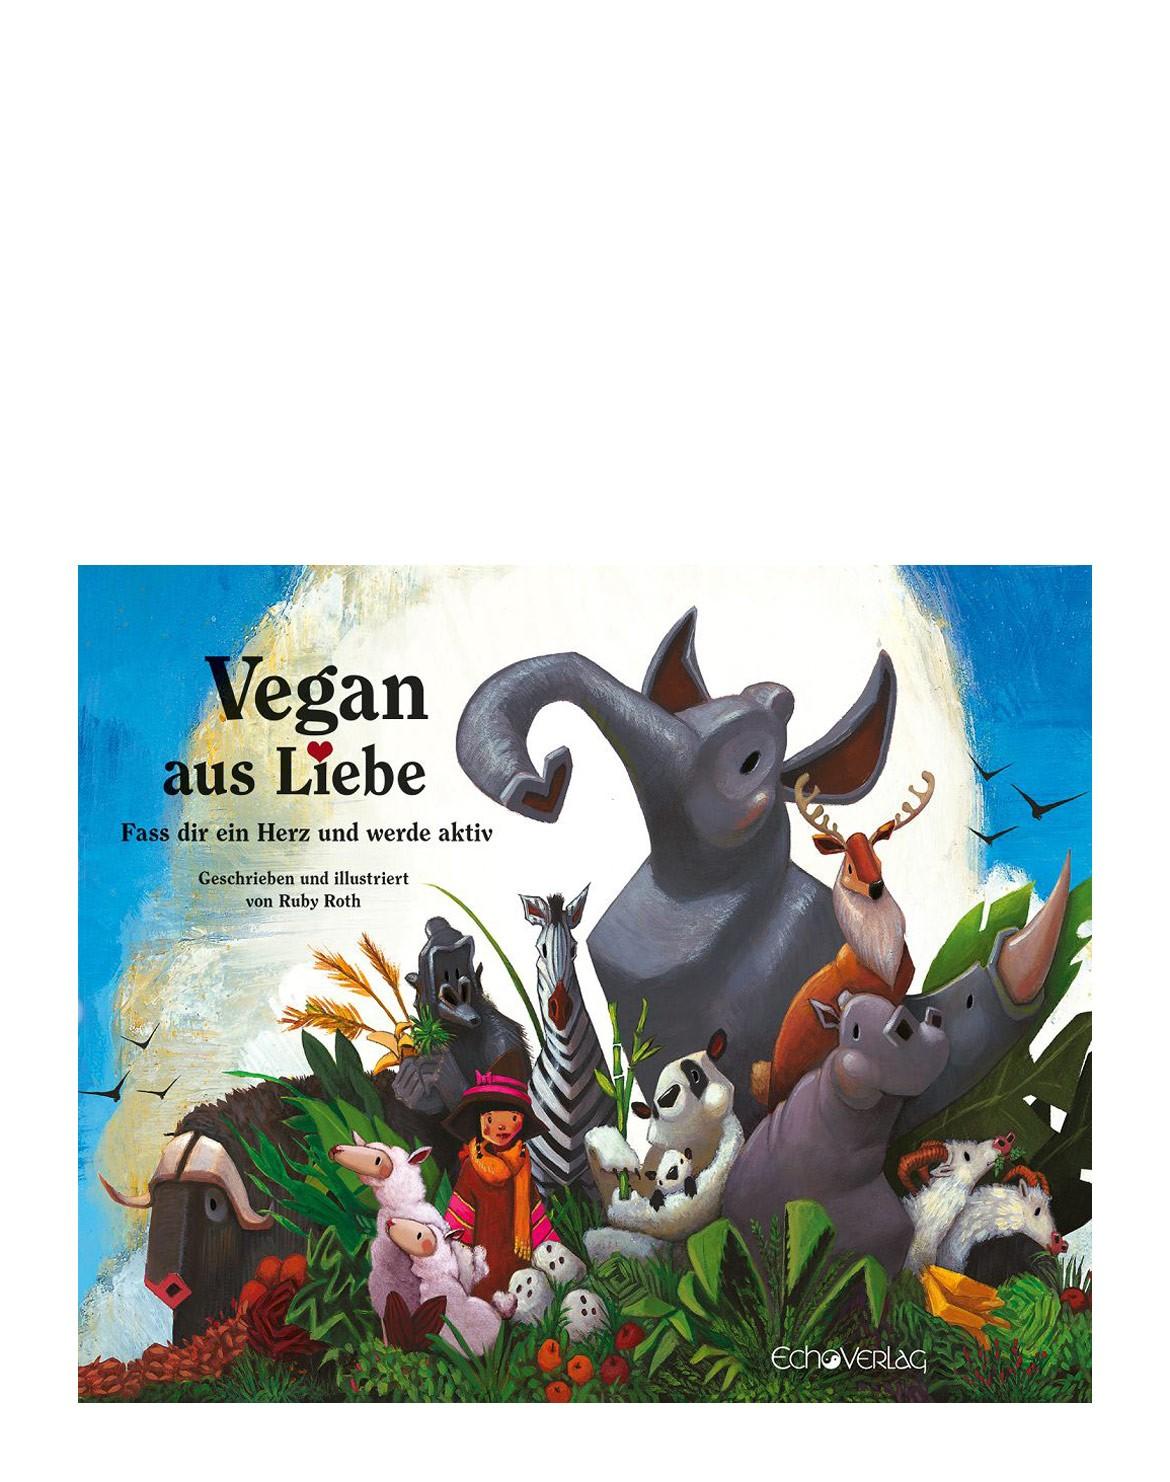 Vegan aus Liebe Book